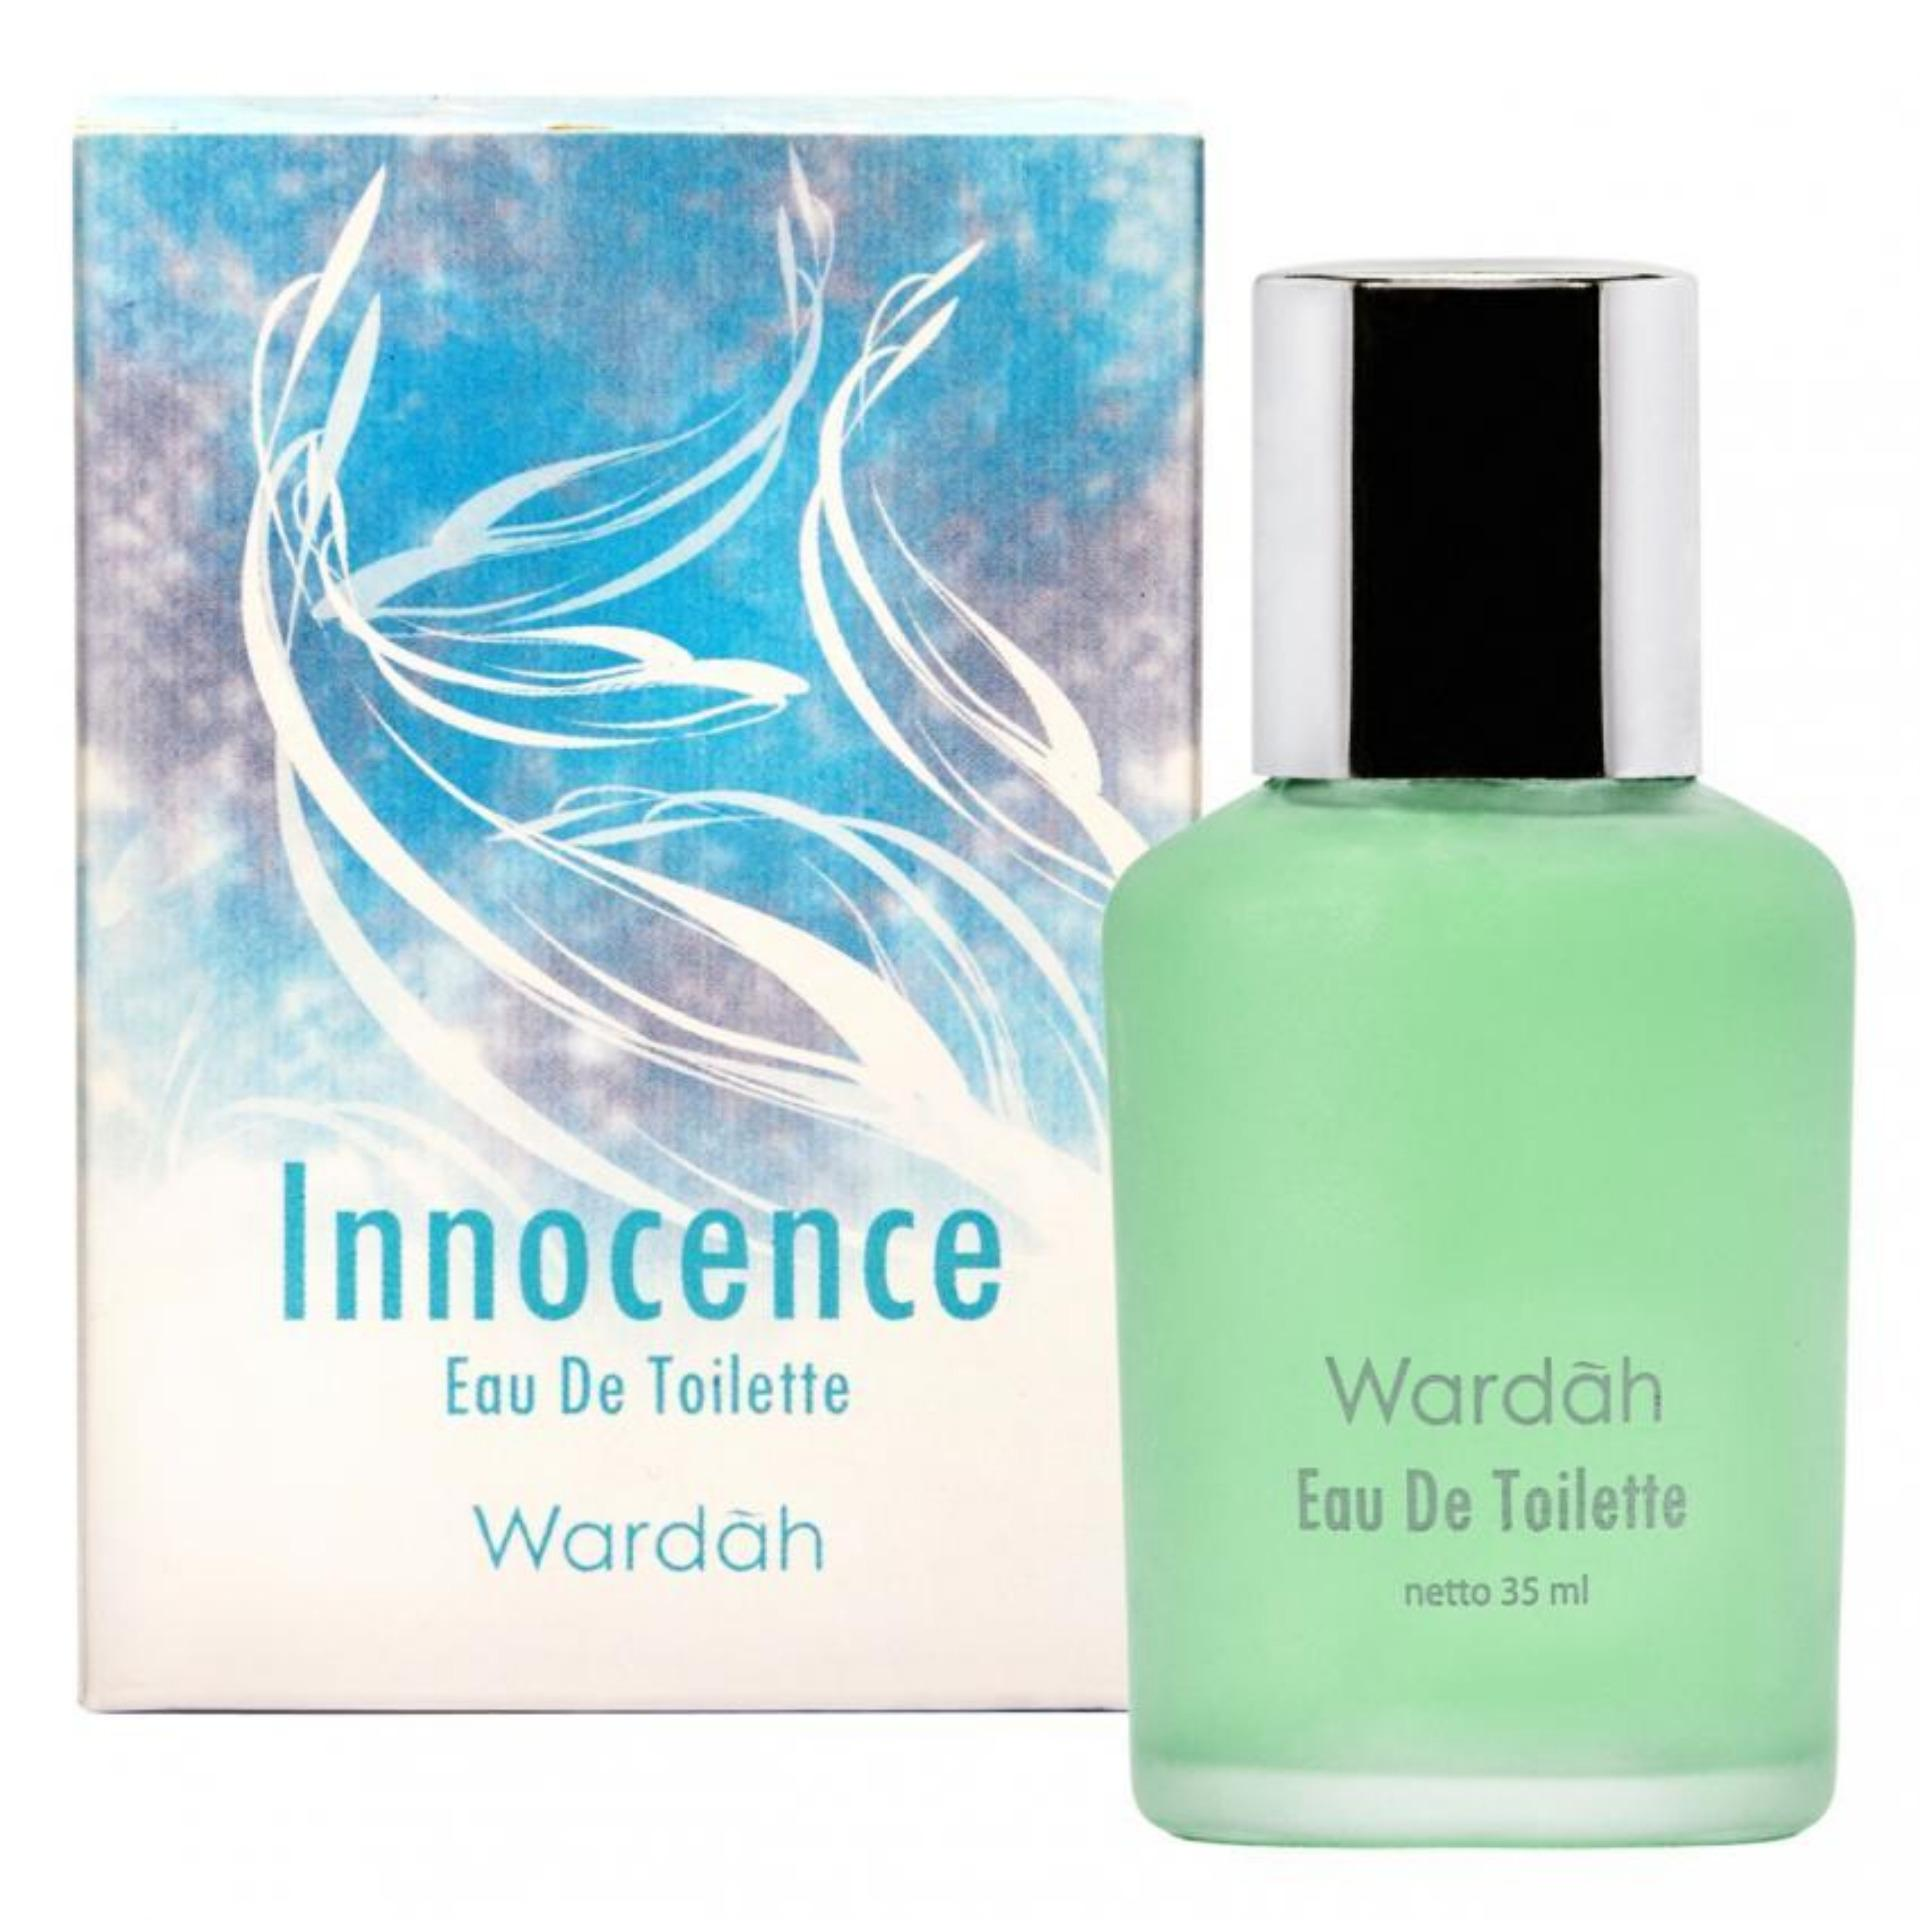 Wardah Innocence EDT Parfum Wanita